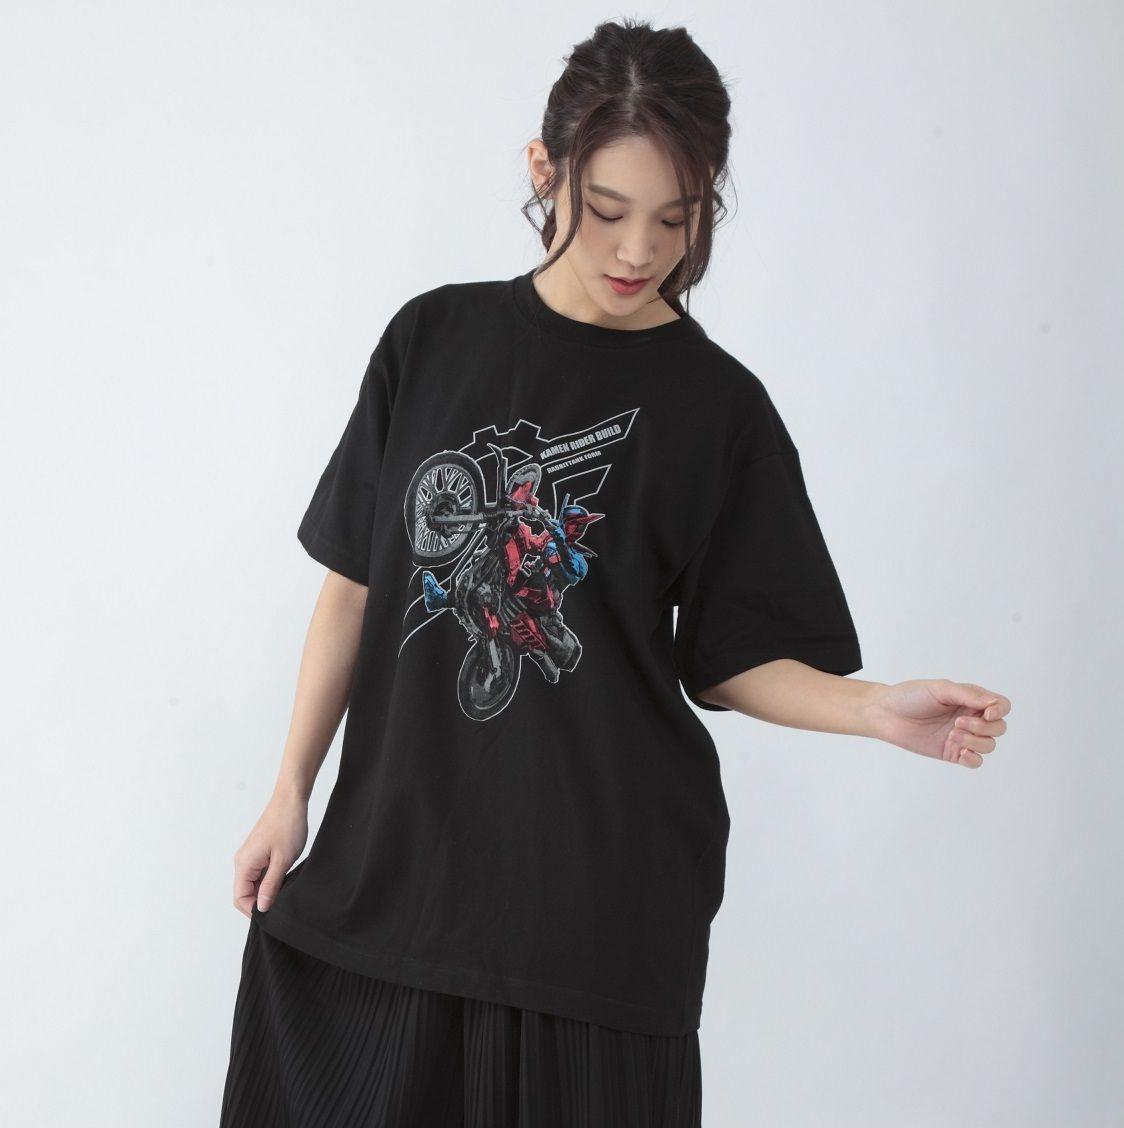 Yoshihito Sugahara Project Kamen Rider Build T-shirt